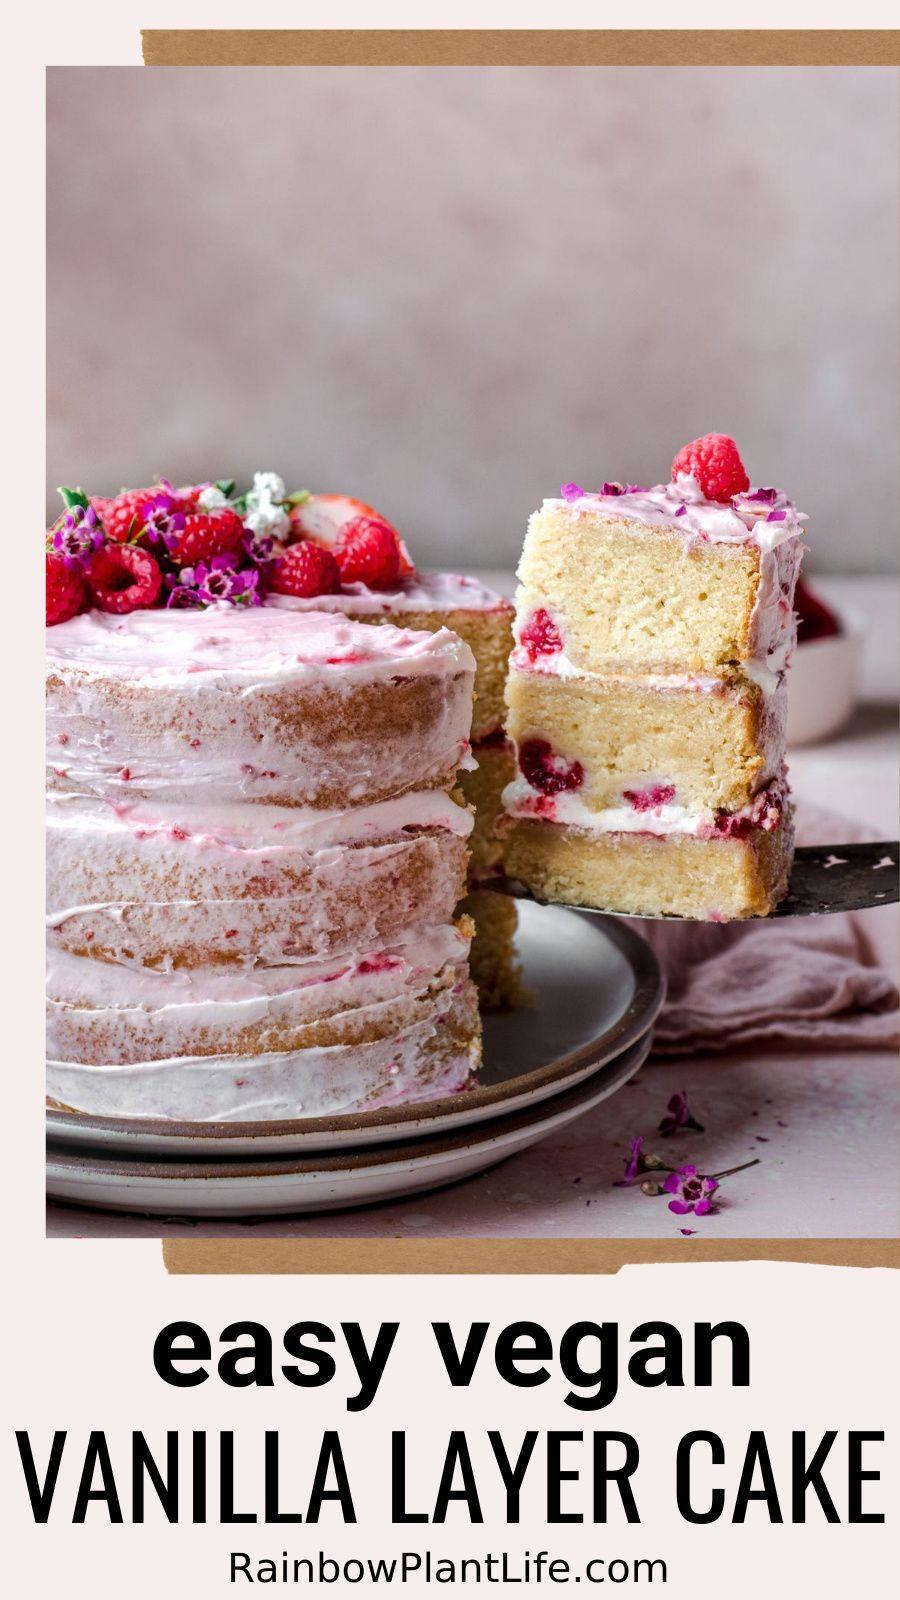 Vegan Vanilla Layer Cake With Raspberry Jam Rainbow Plant Life In 2020 Vegan Vanilla Cake Vegan Cake Recipes Easy Vegan Cake Recipe